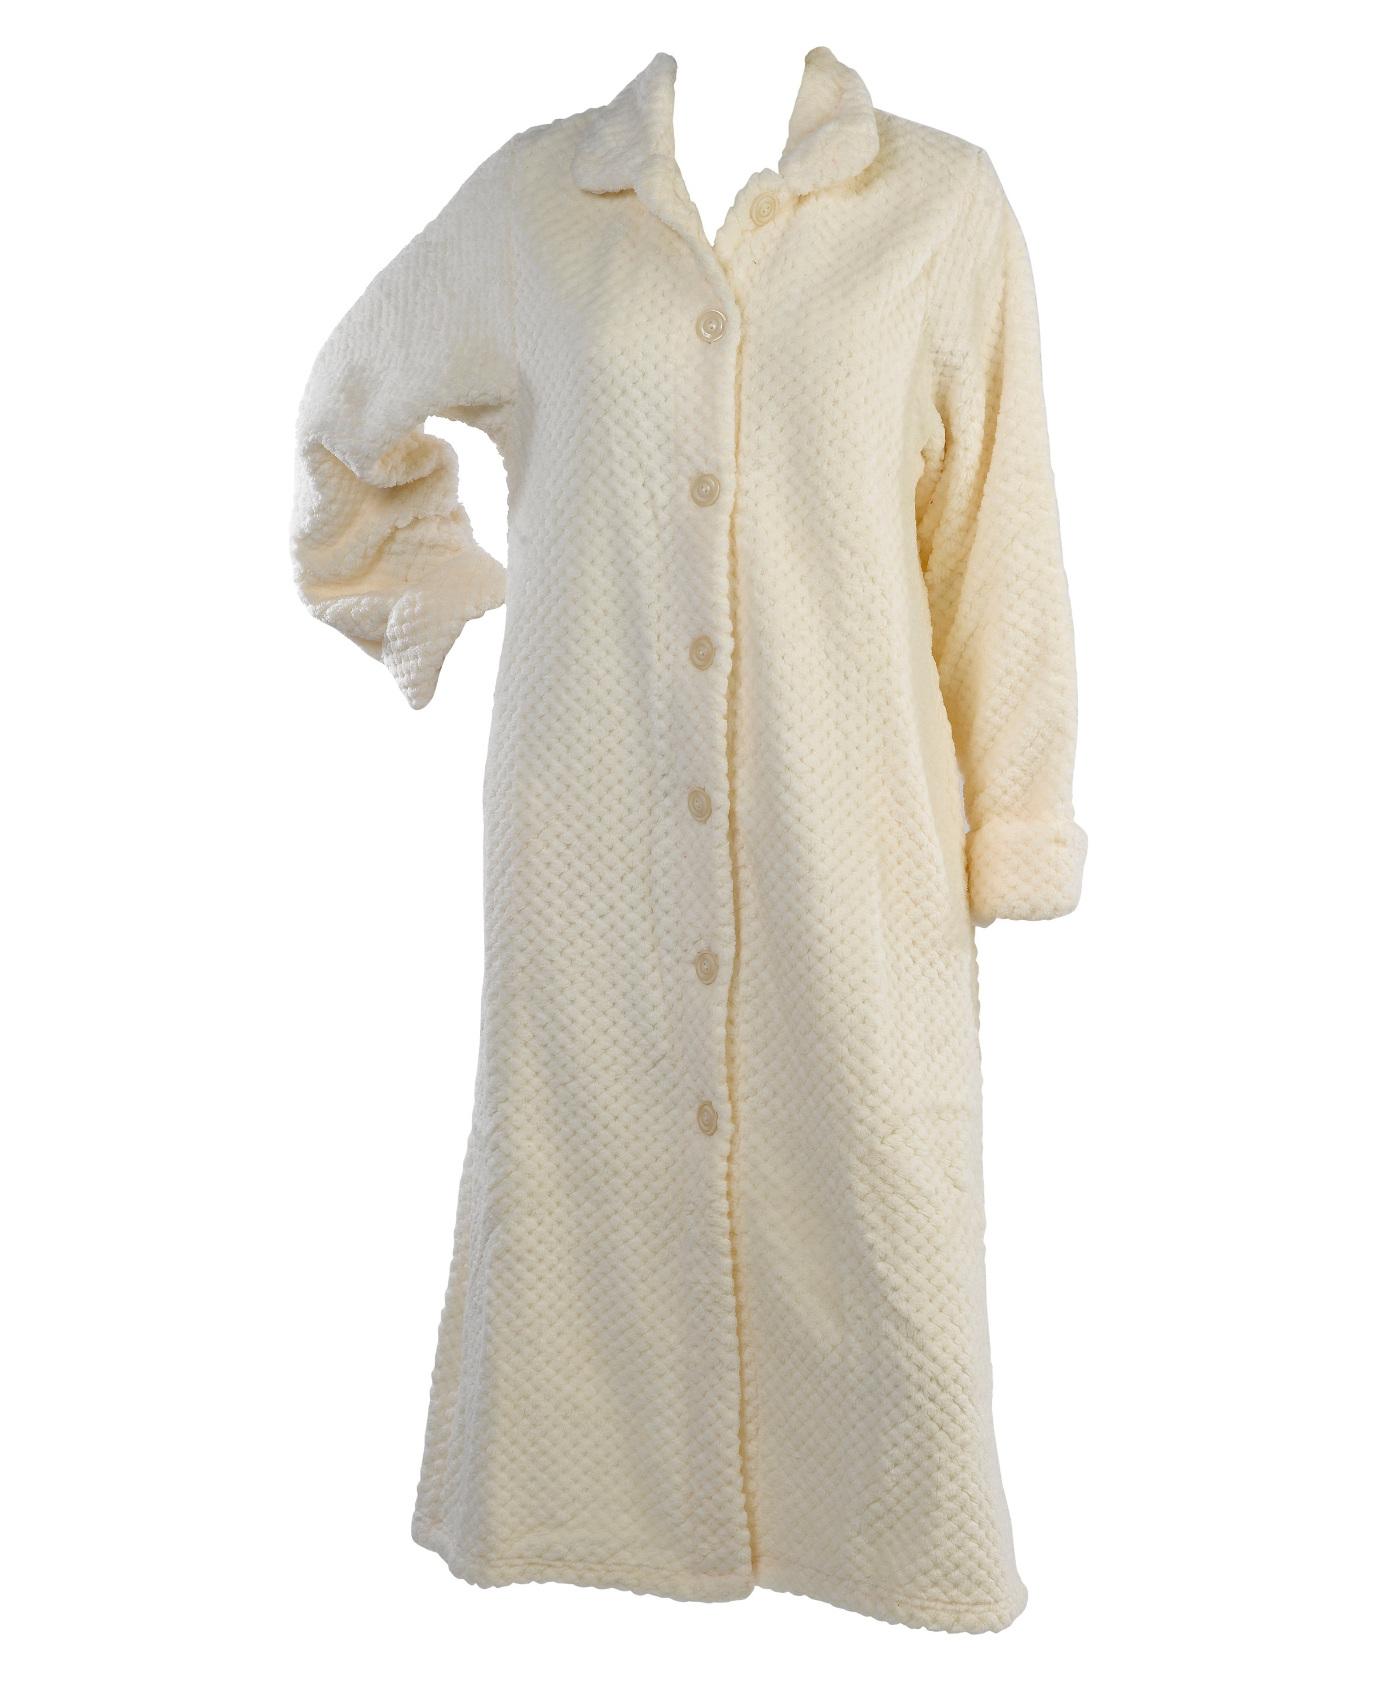 Sleep wear collection on eBay!